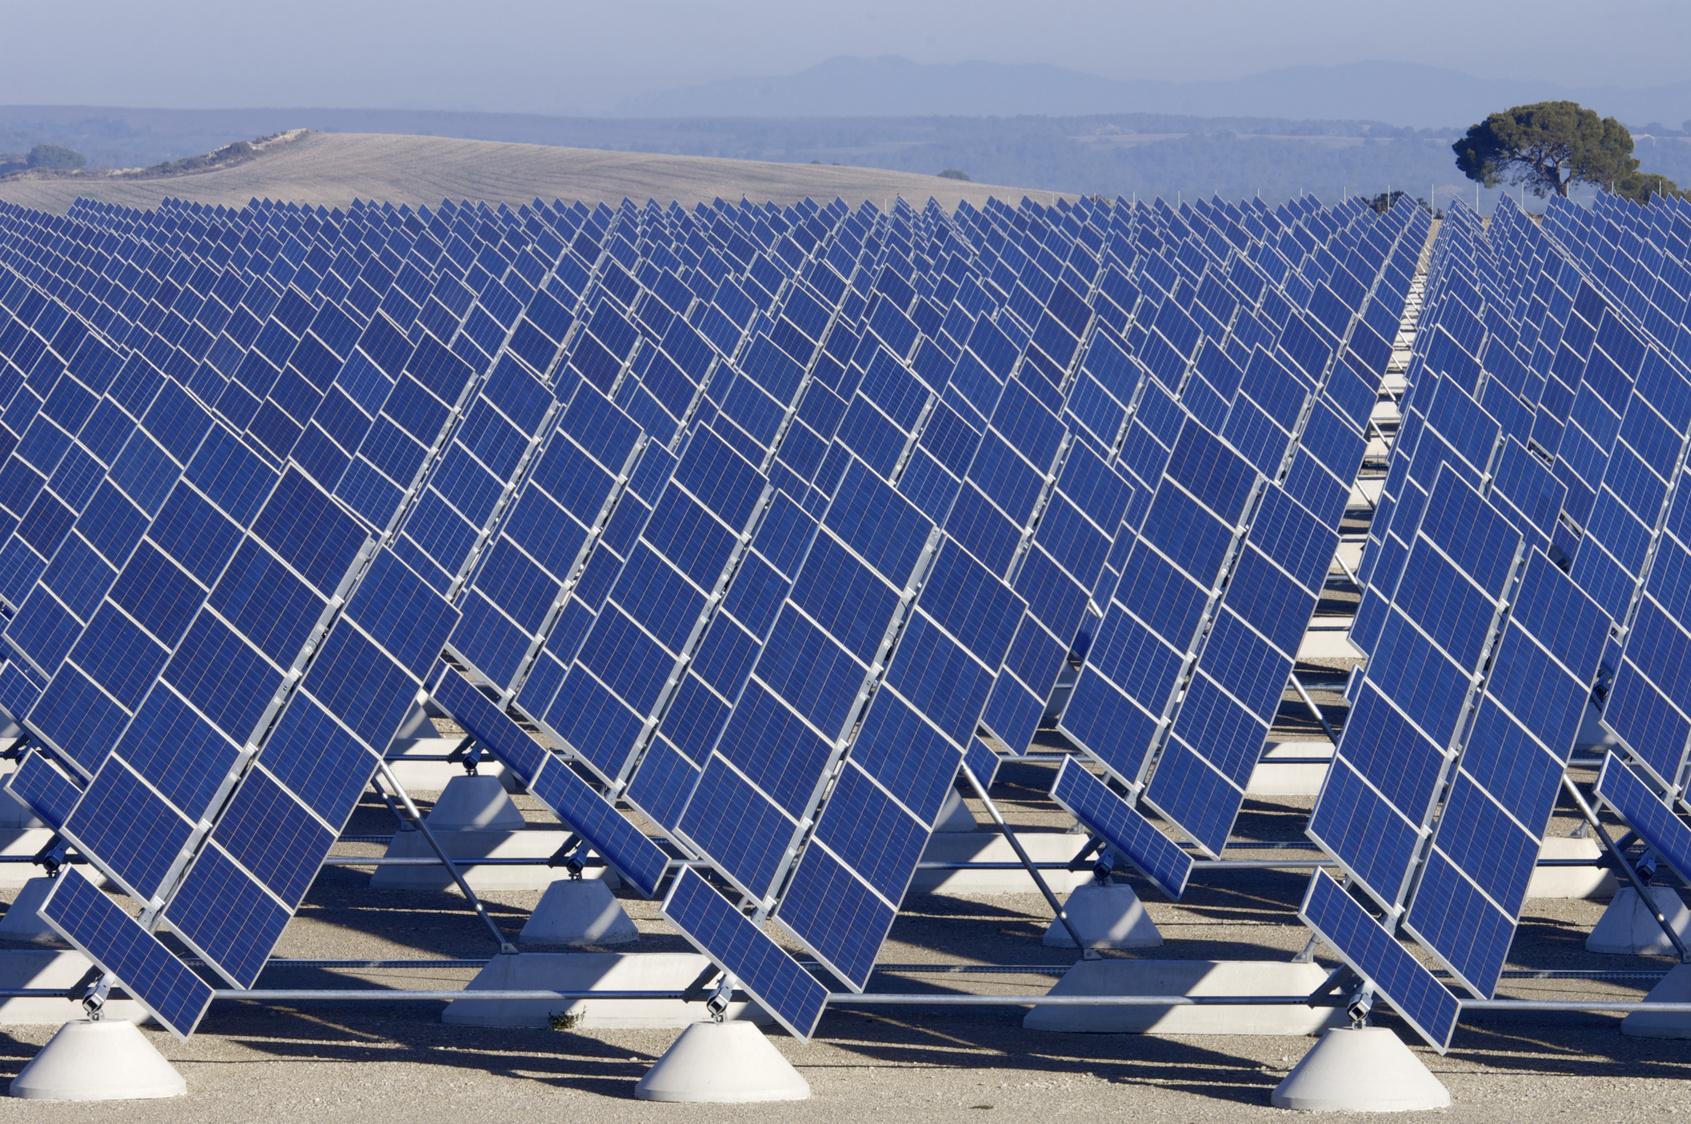 EIA: Expanding energy policies would spur renewables, efficiency | Utility Dive